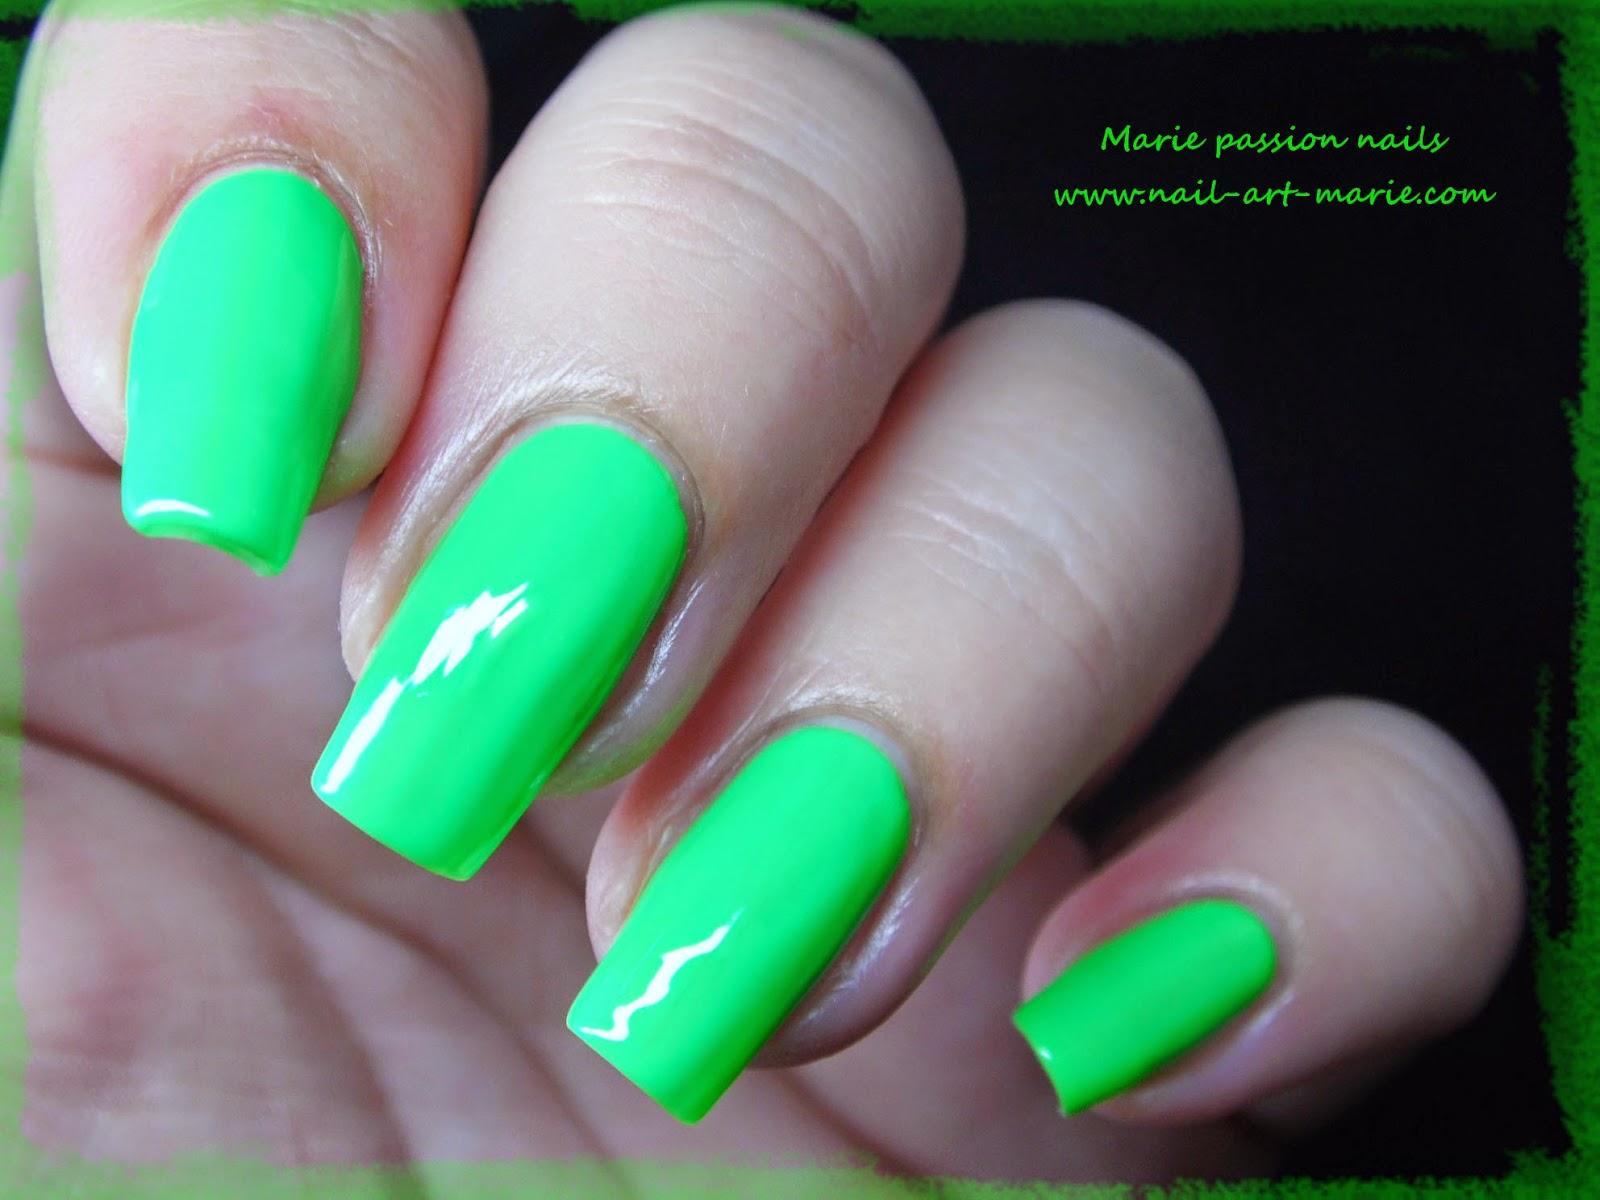 LM Cosmetic Duchamp5